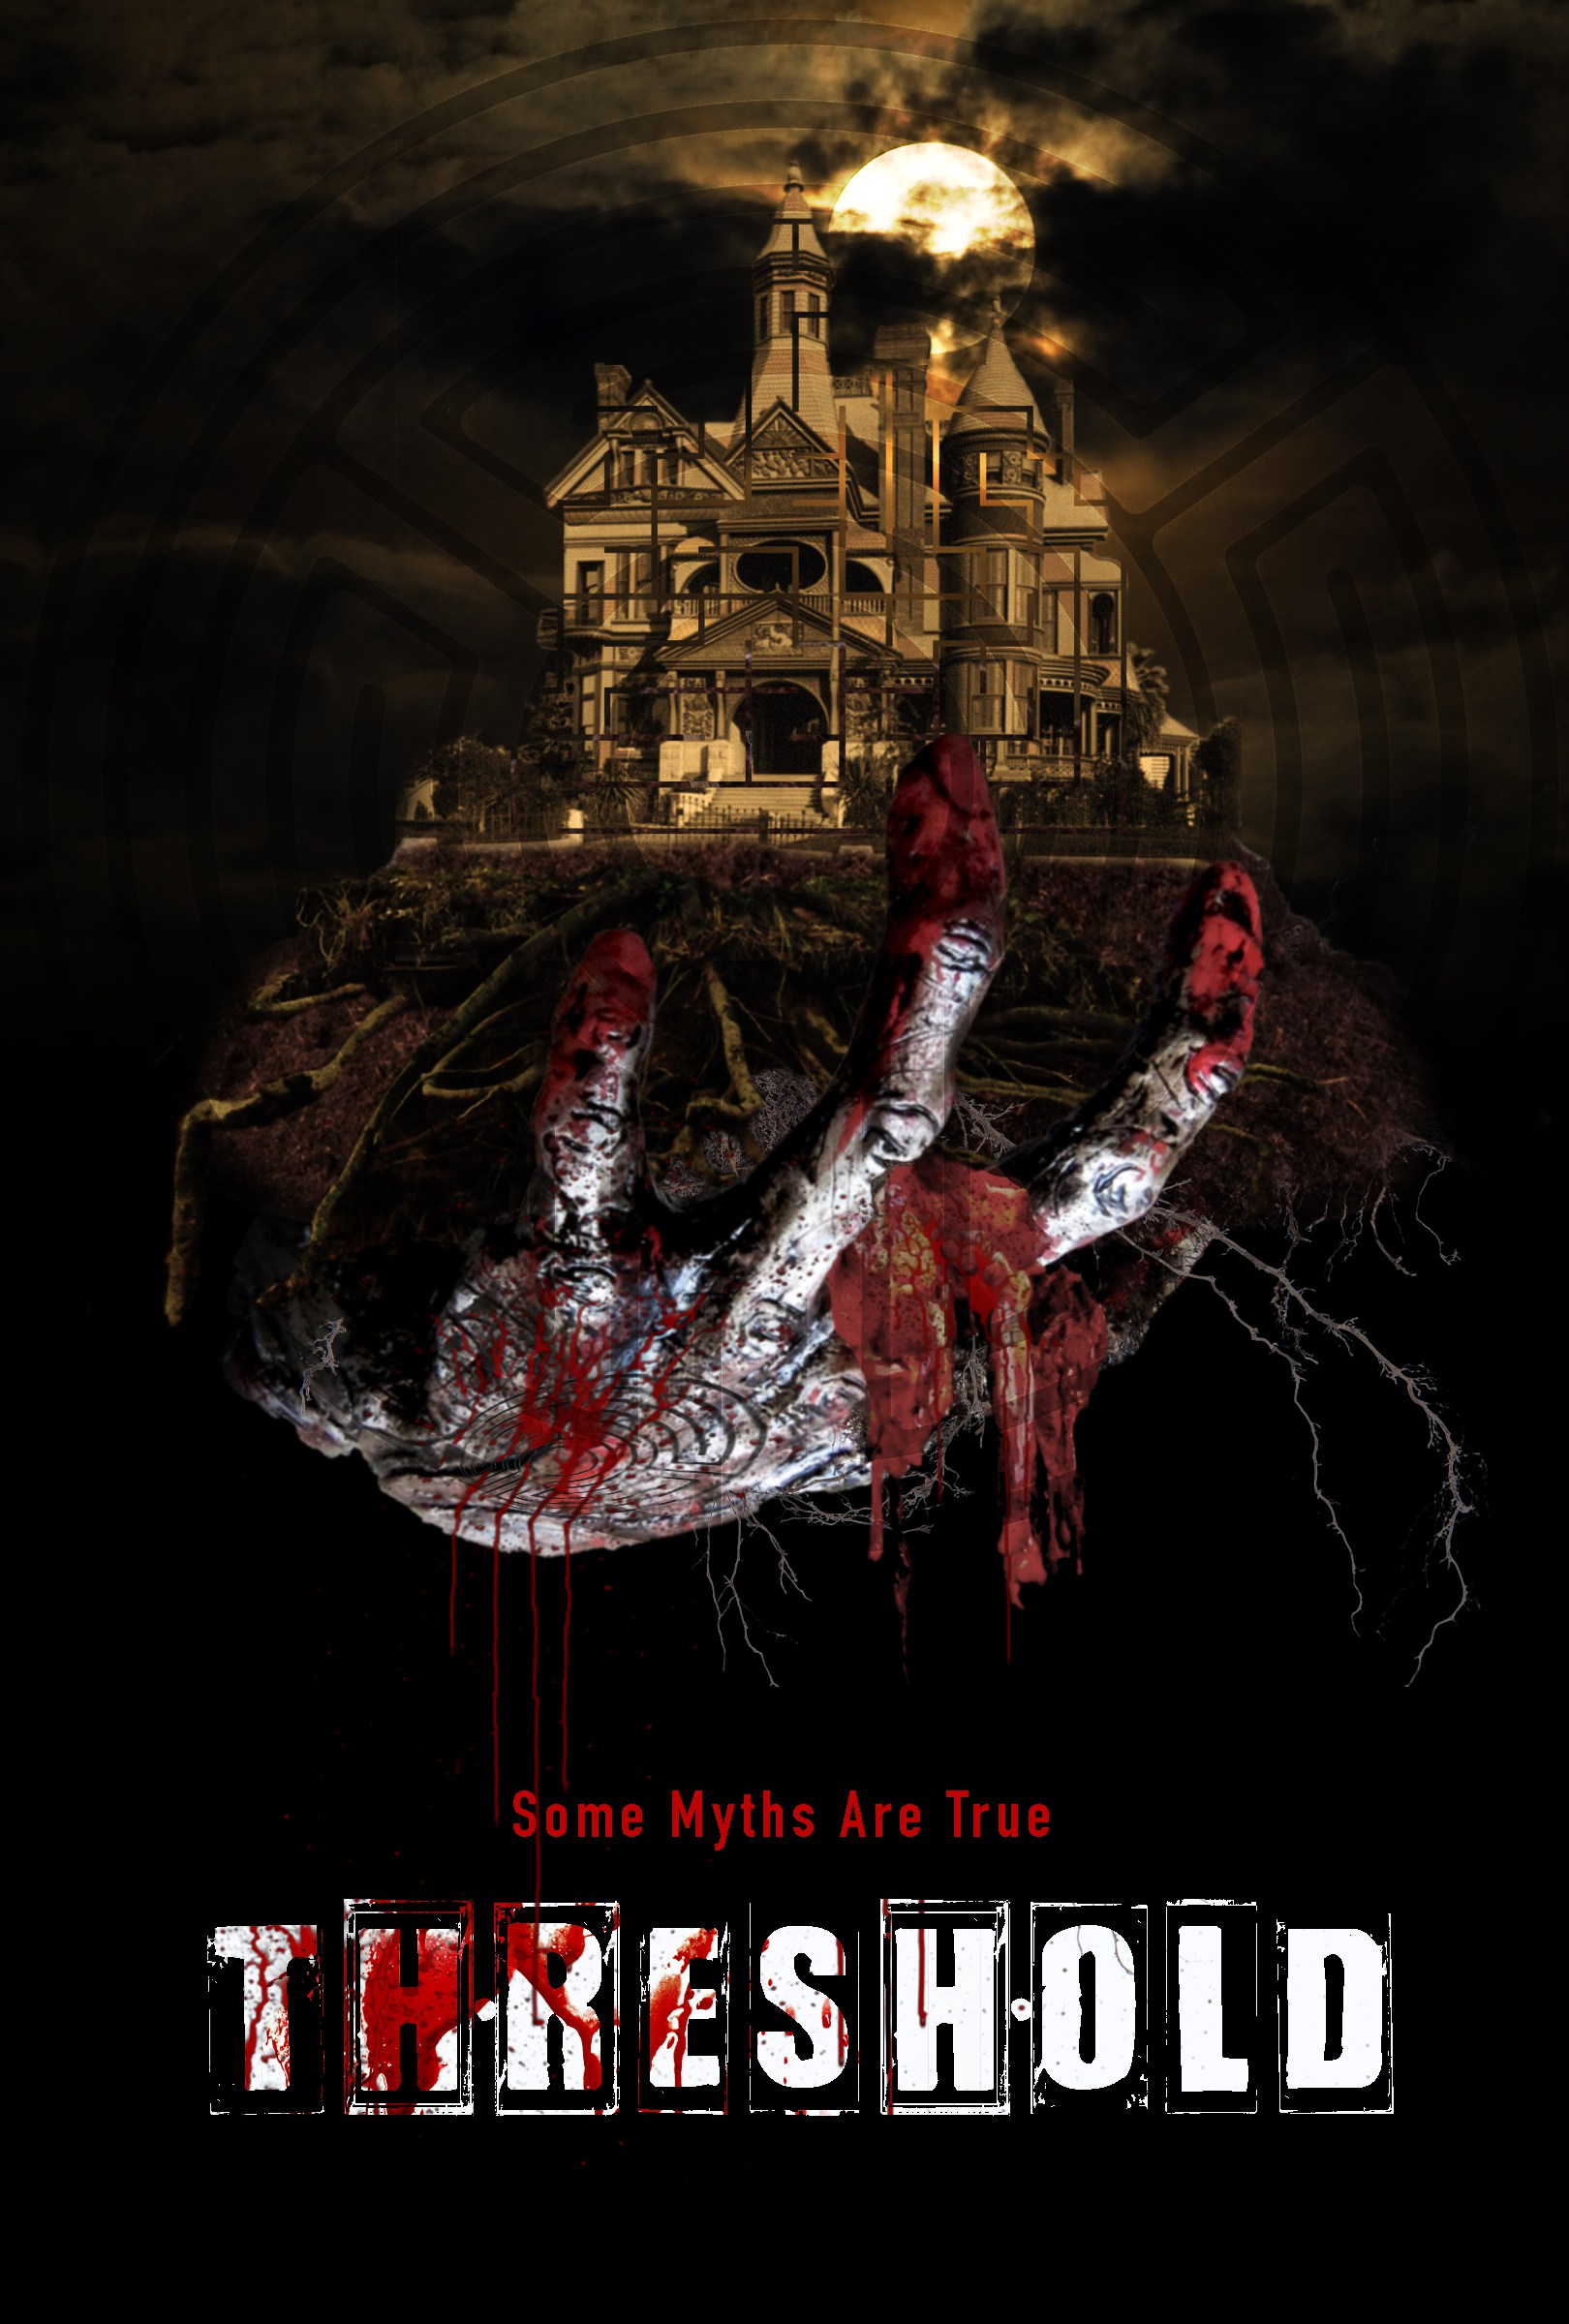 Threshold-movie-film-2018-horror-minotaurmrhorrorpedia